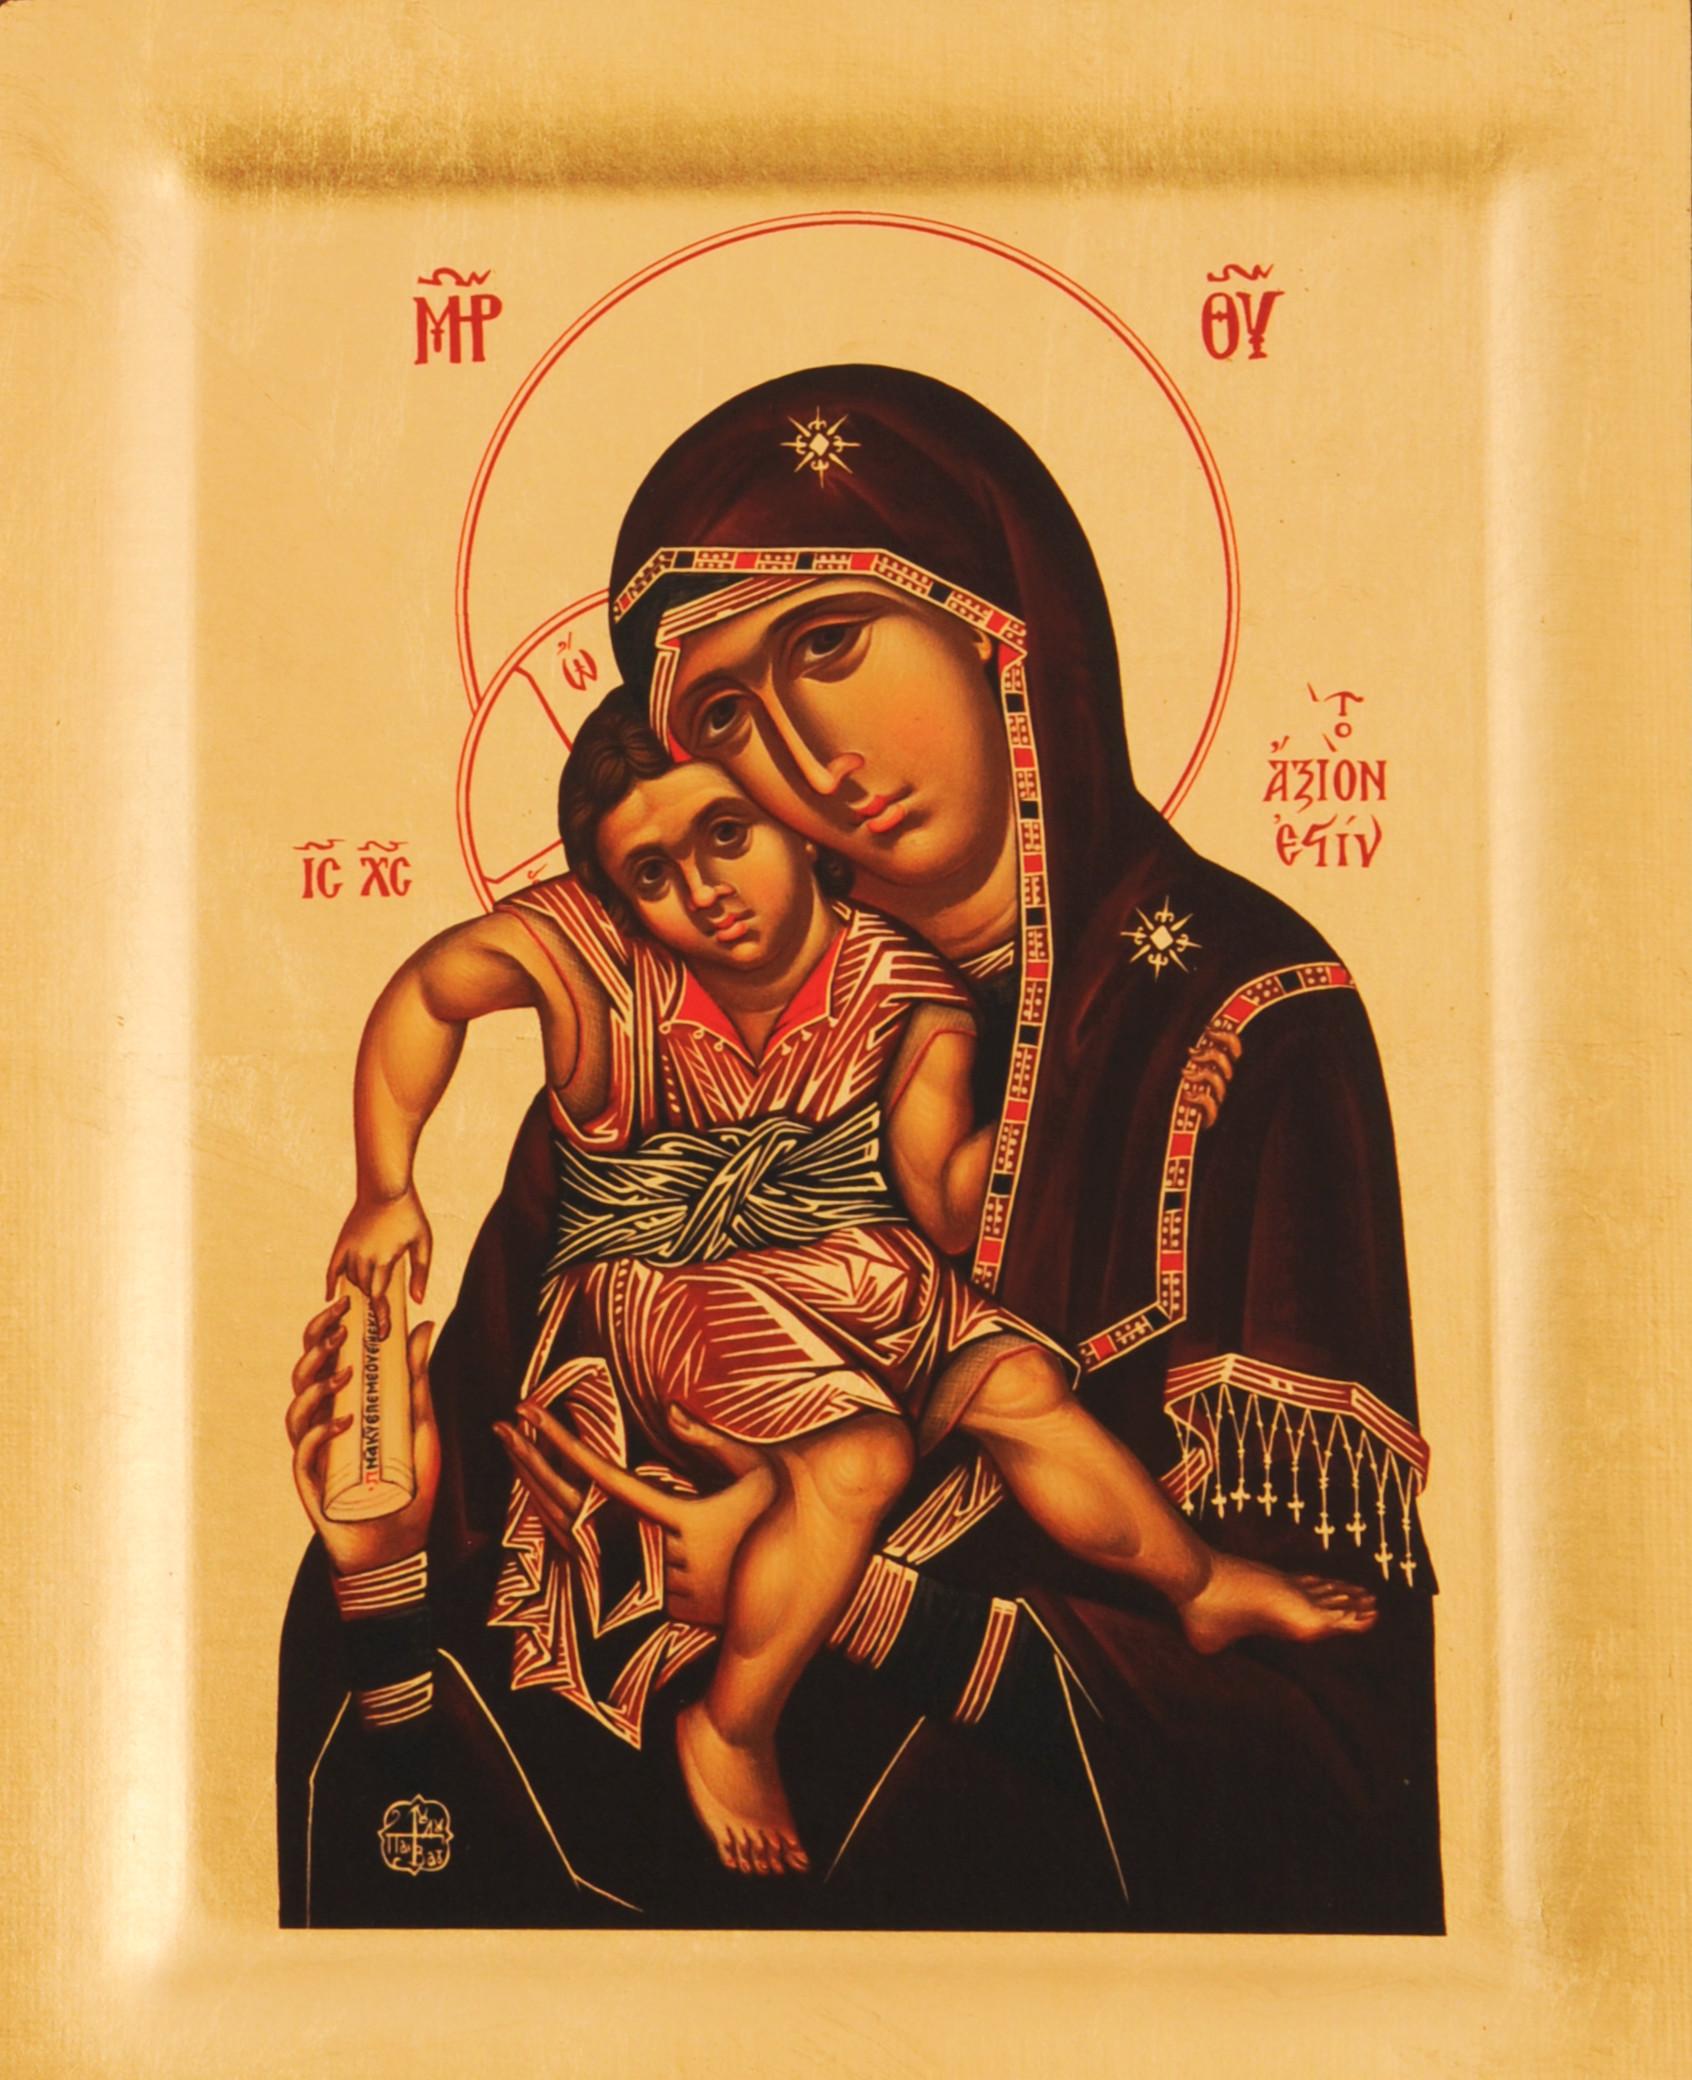 Icoana Maica Domnului Axion Estin – Vrednica esti, Biserica Protaton - Icoana cu foite de aur si matase, pe lemn (reproducere)